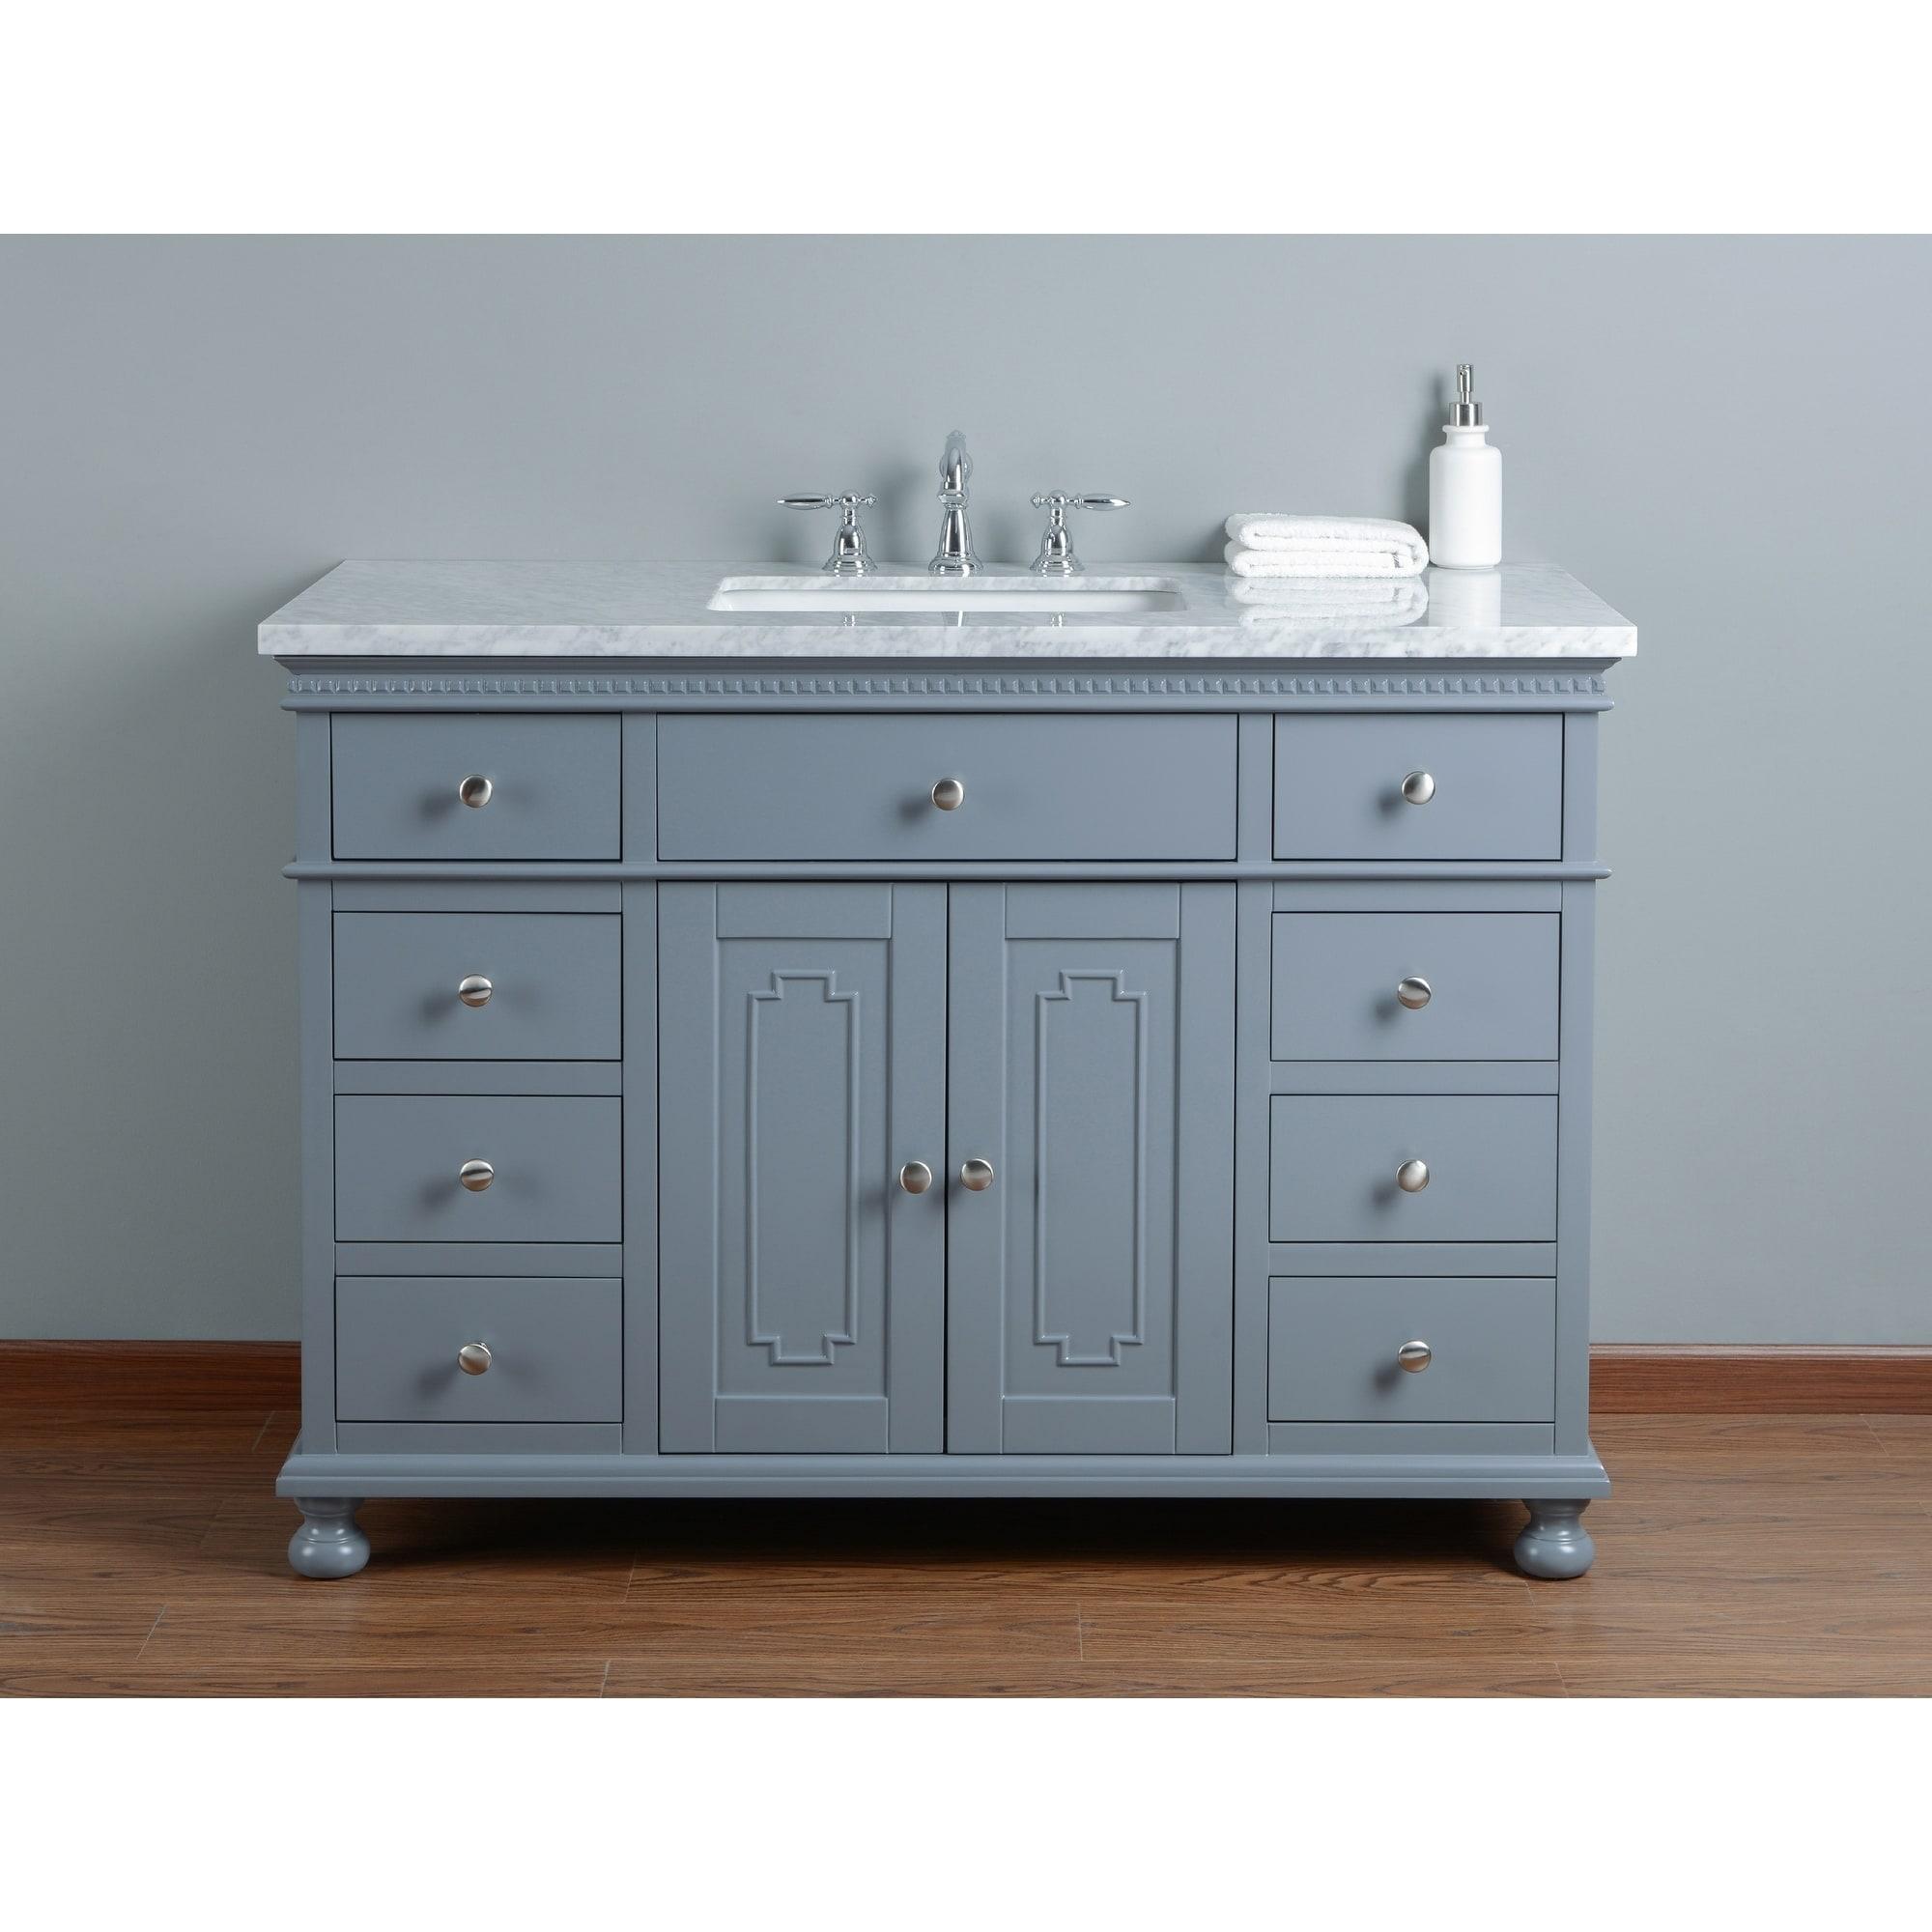 Shop Stufurhome Abigail Embellished 48 in. Grey Single Sink Bathroom ...